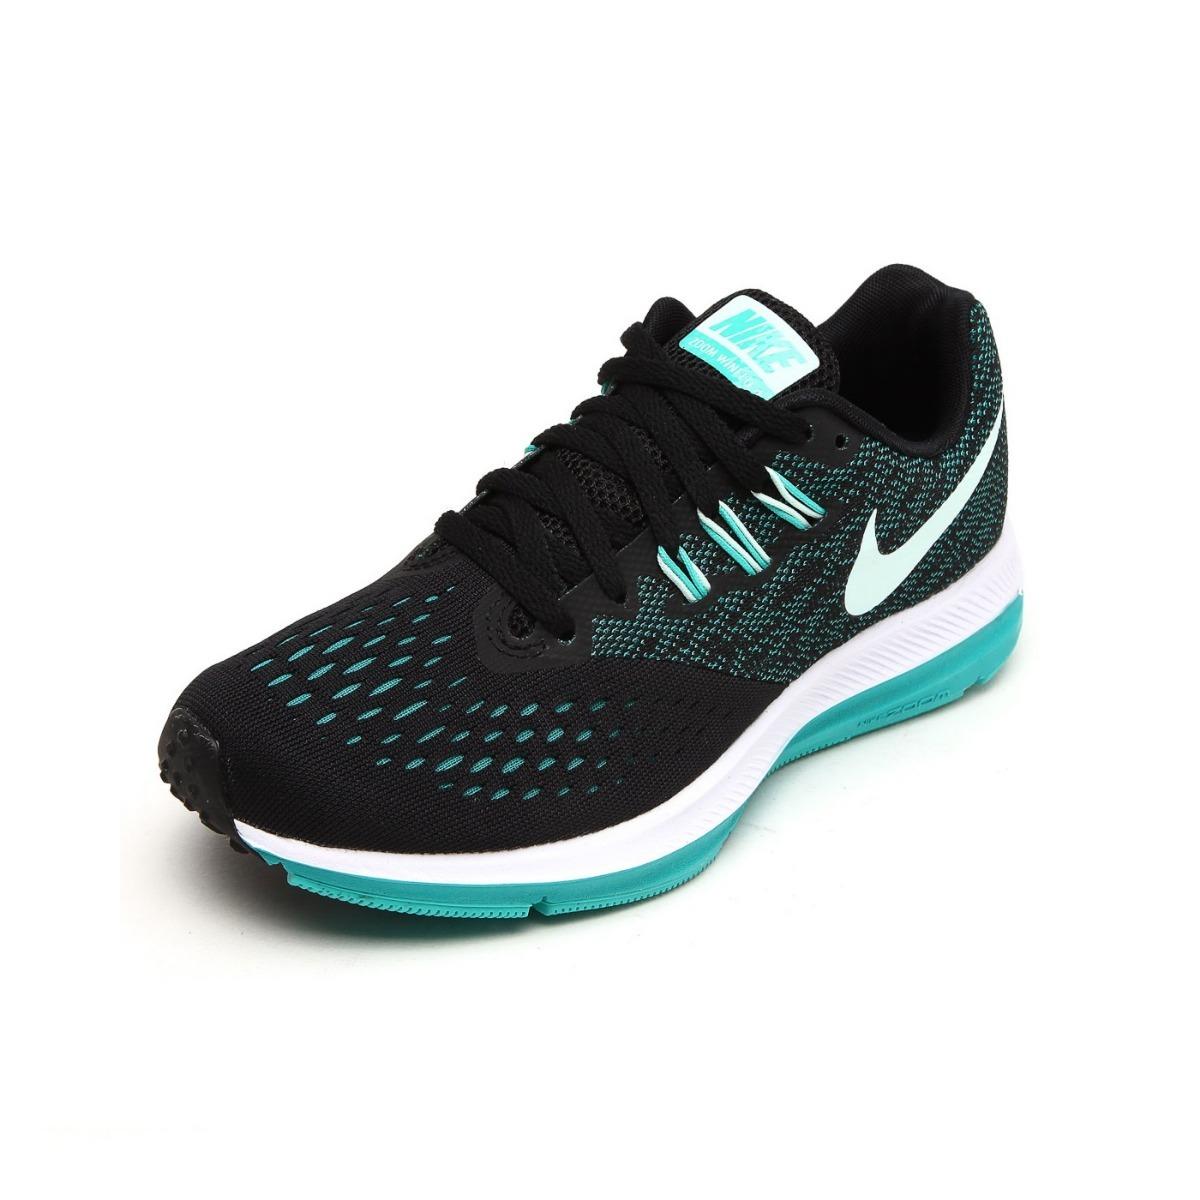 23fa51fa0d0 tênis nike zoom winflo 4 898485 running feminino original. Carregando zoom.